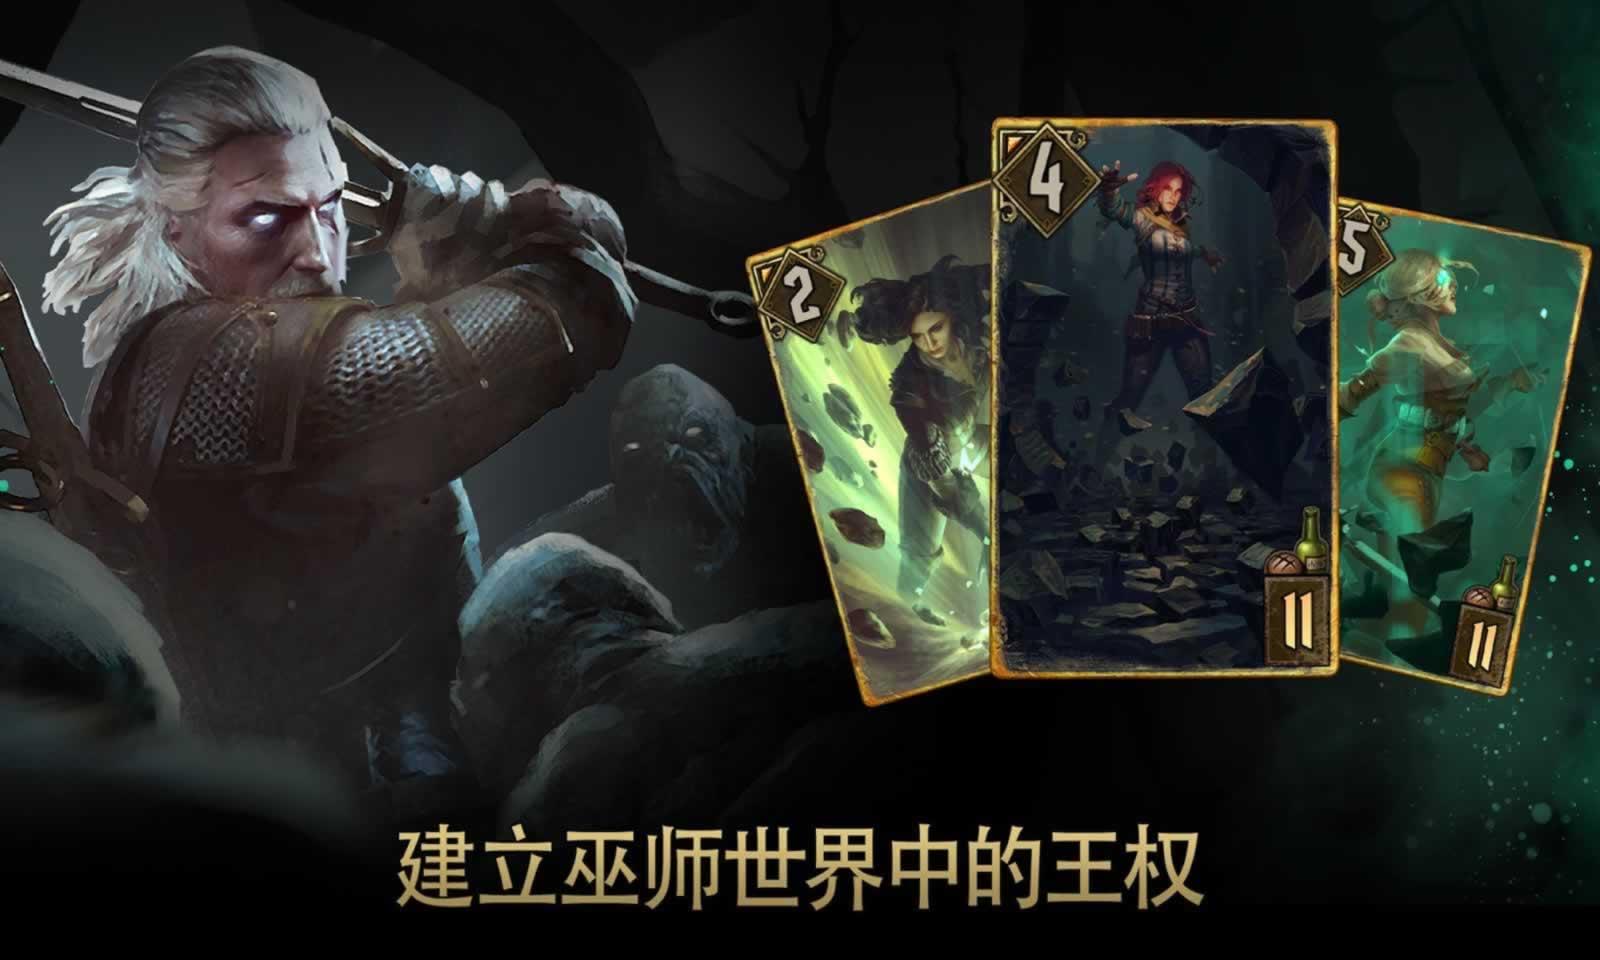 昆特牌iOS苹果版(Gwent The Witcher Card Game)图2: